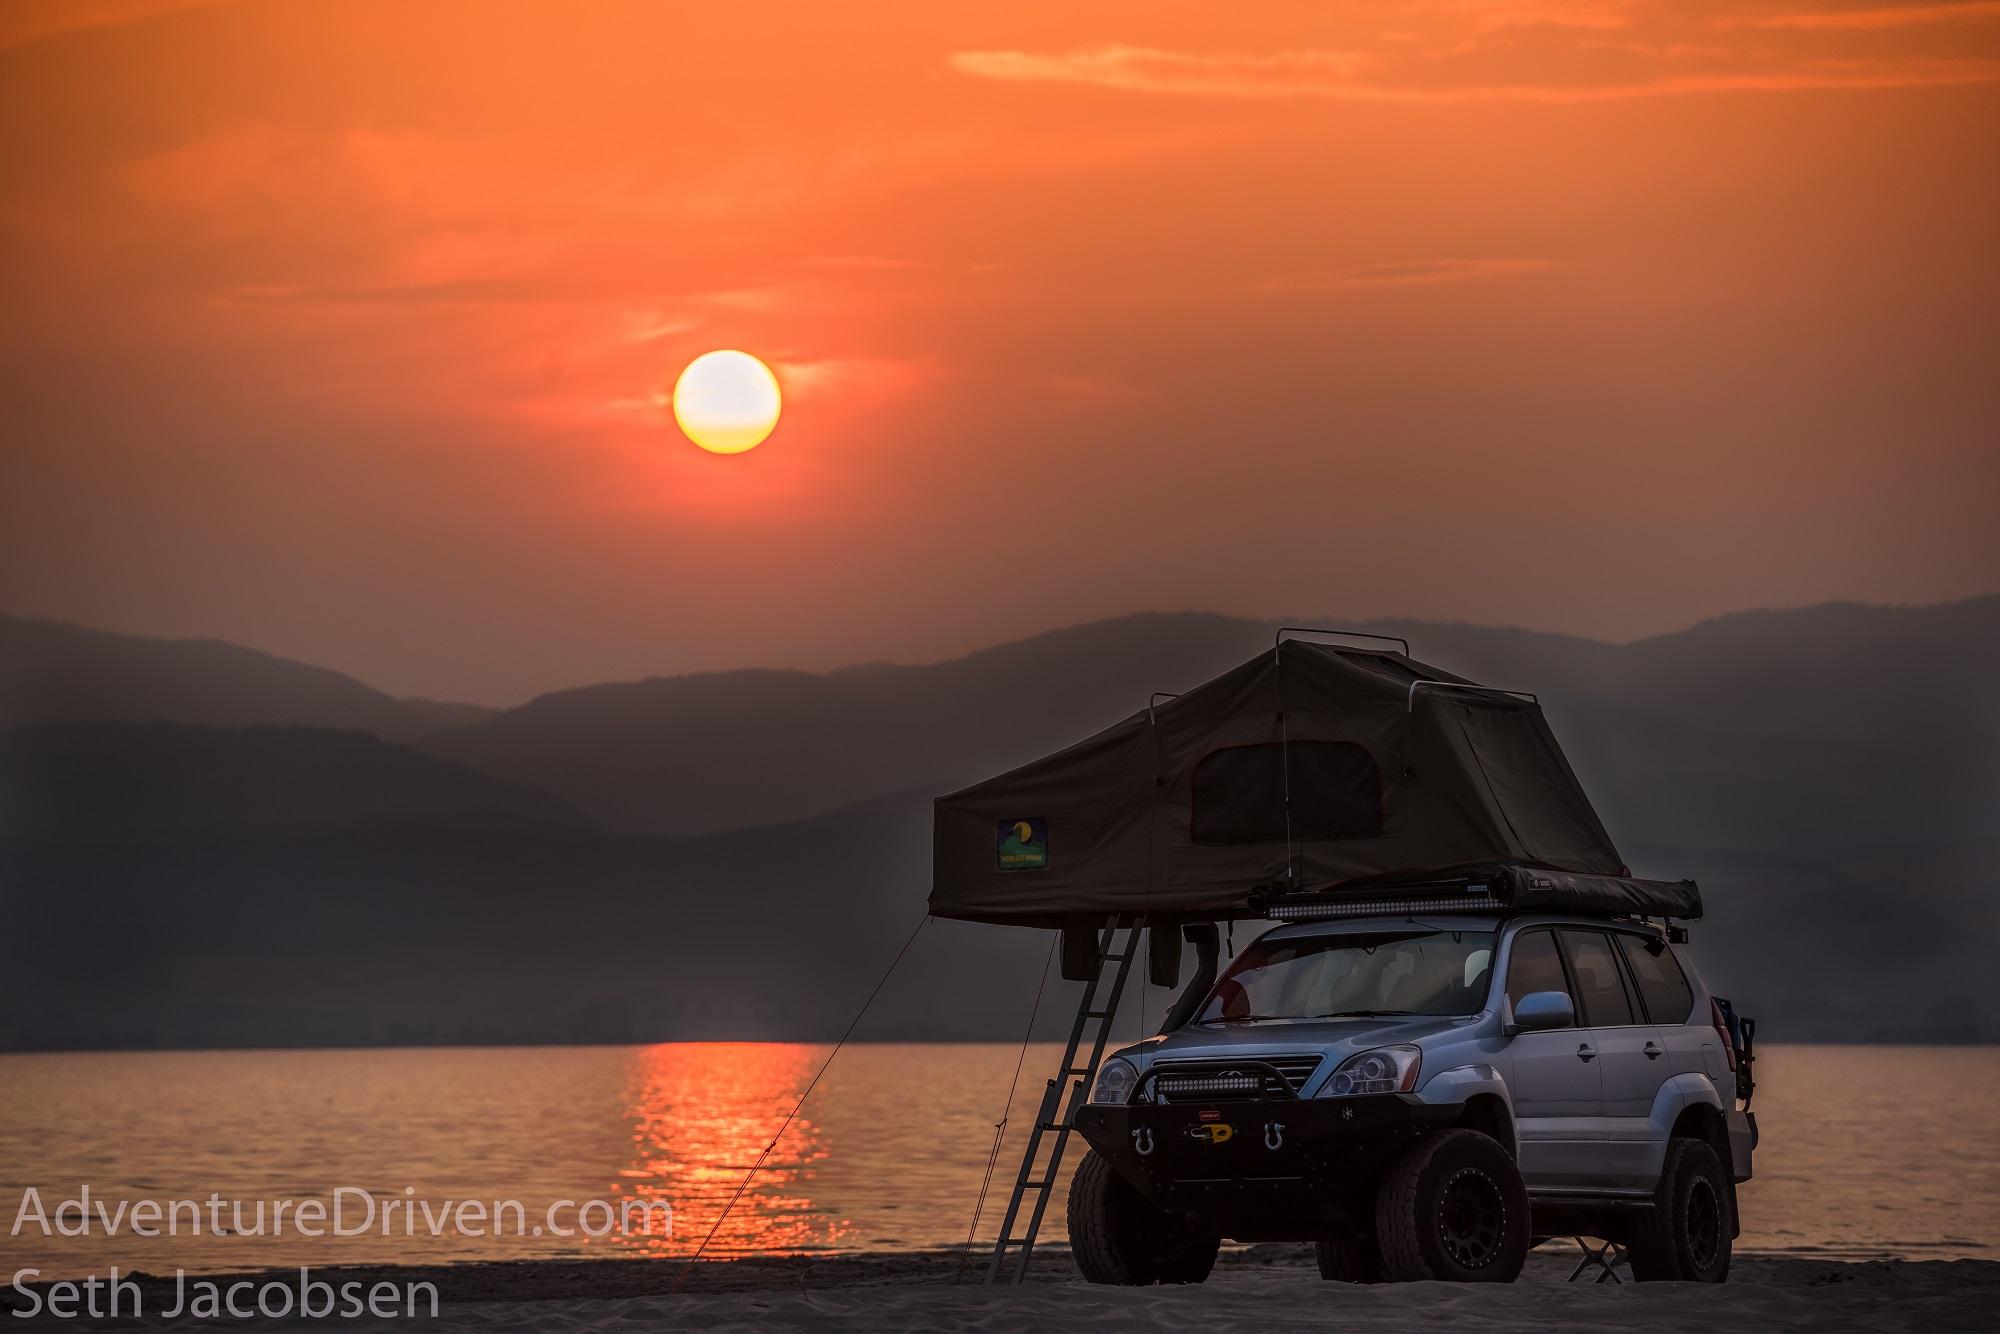 adventure driven gx470 lexus beach-1